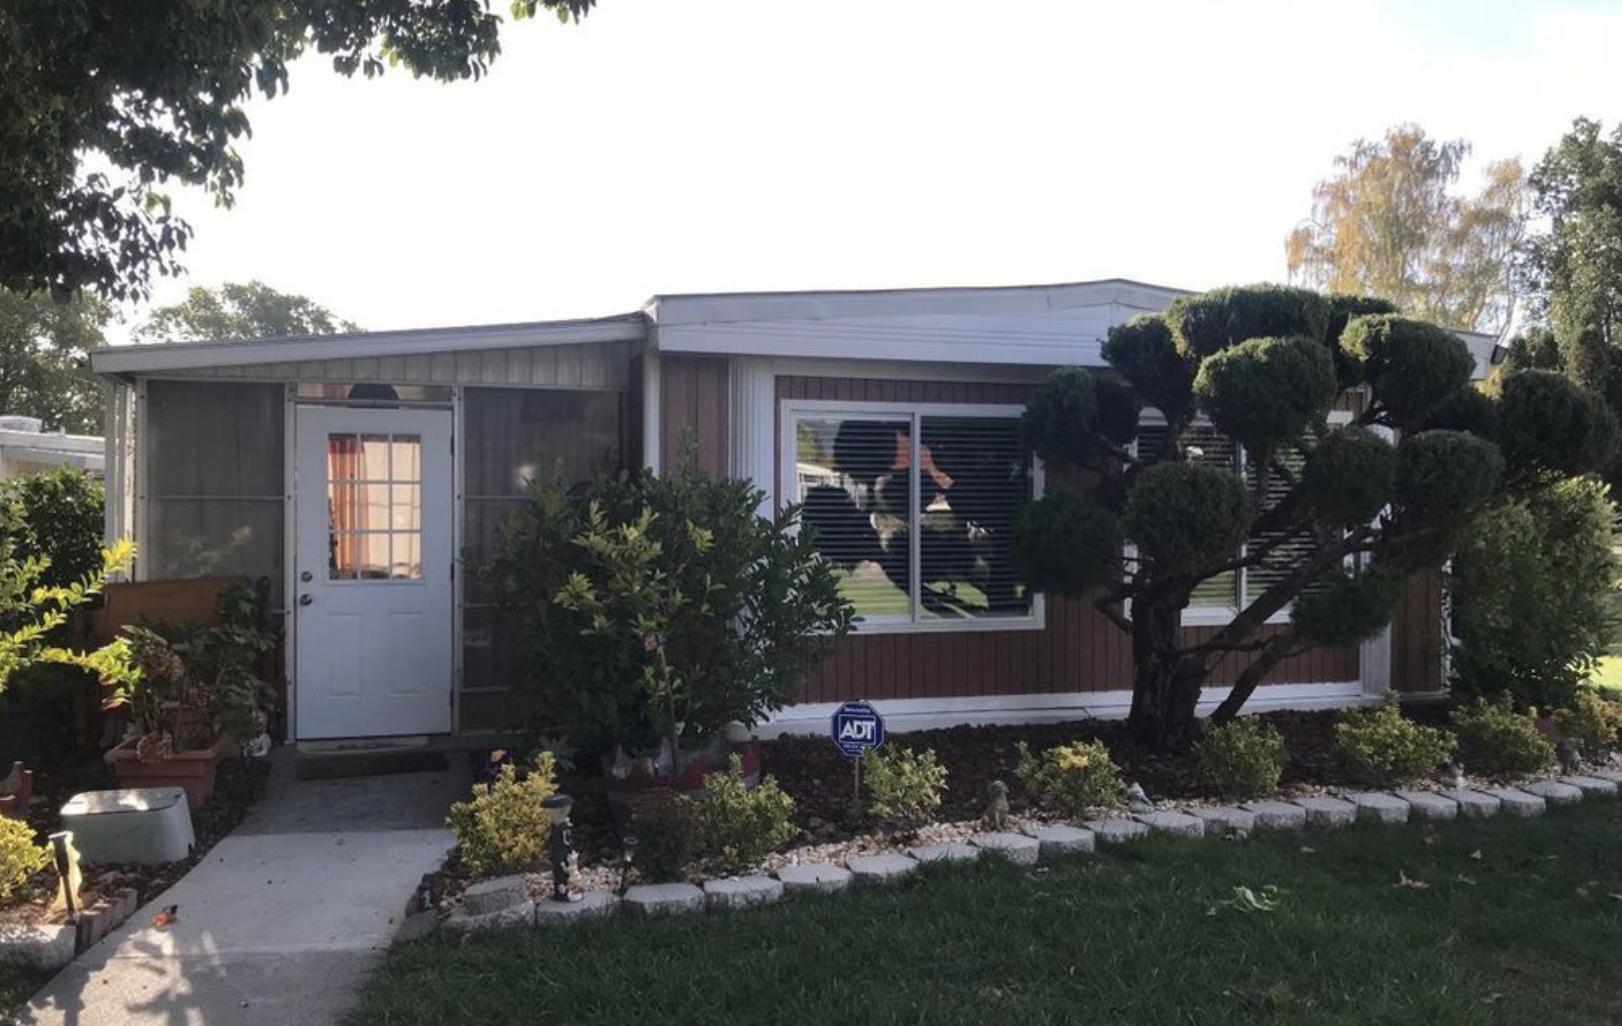 Landscaping 308 Janero Pl, Sonoma, CA mobile home carport addition